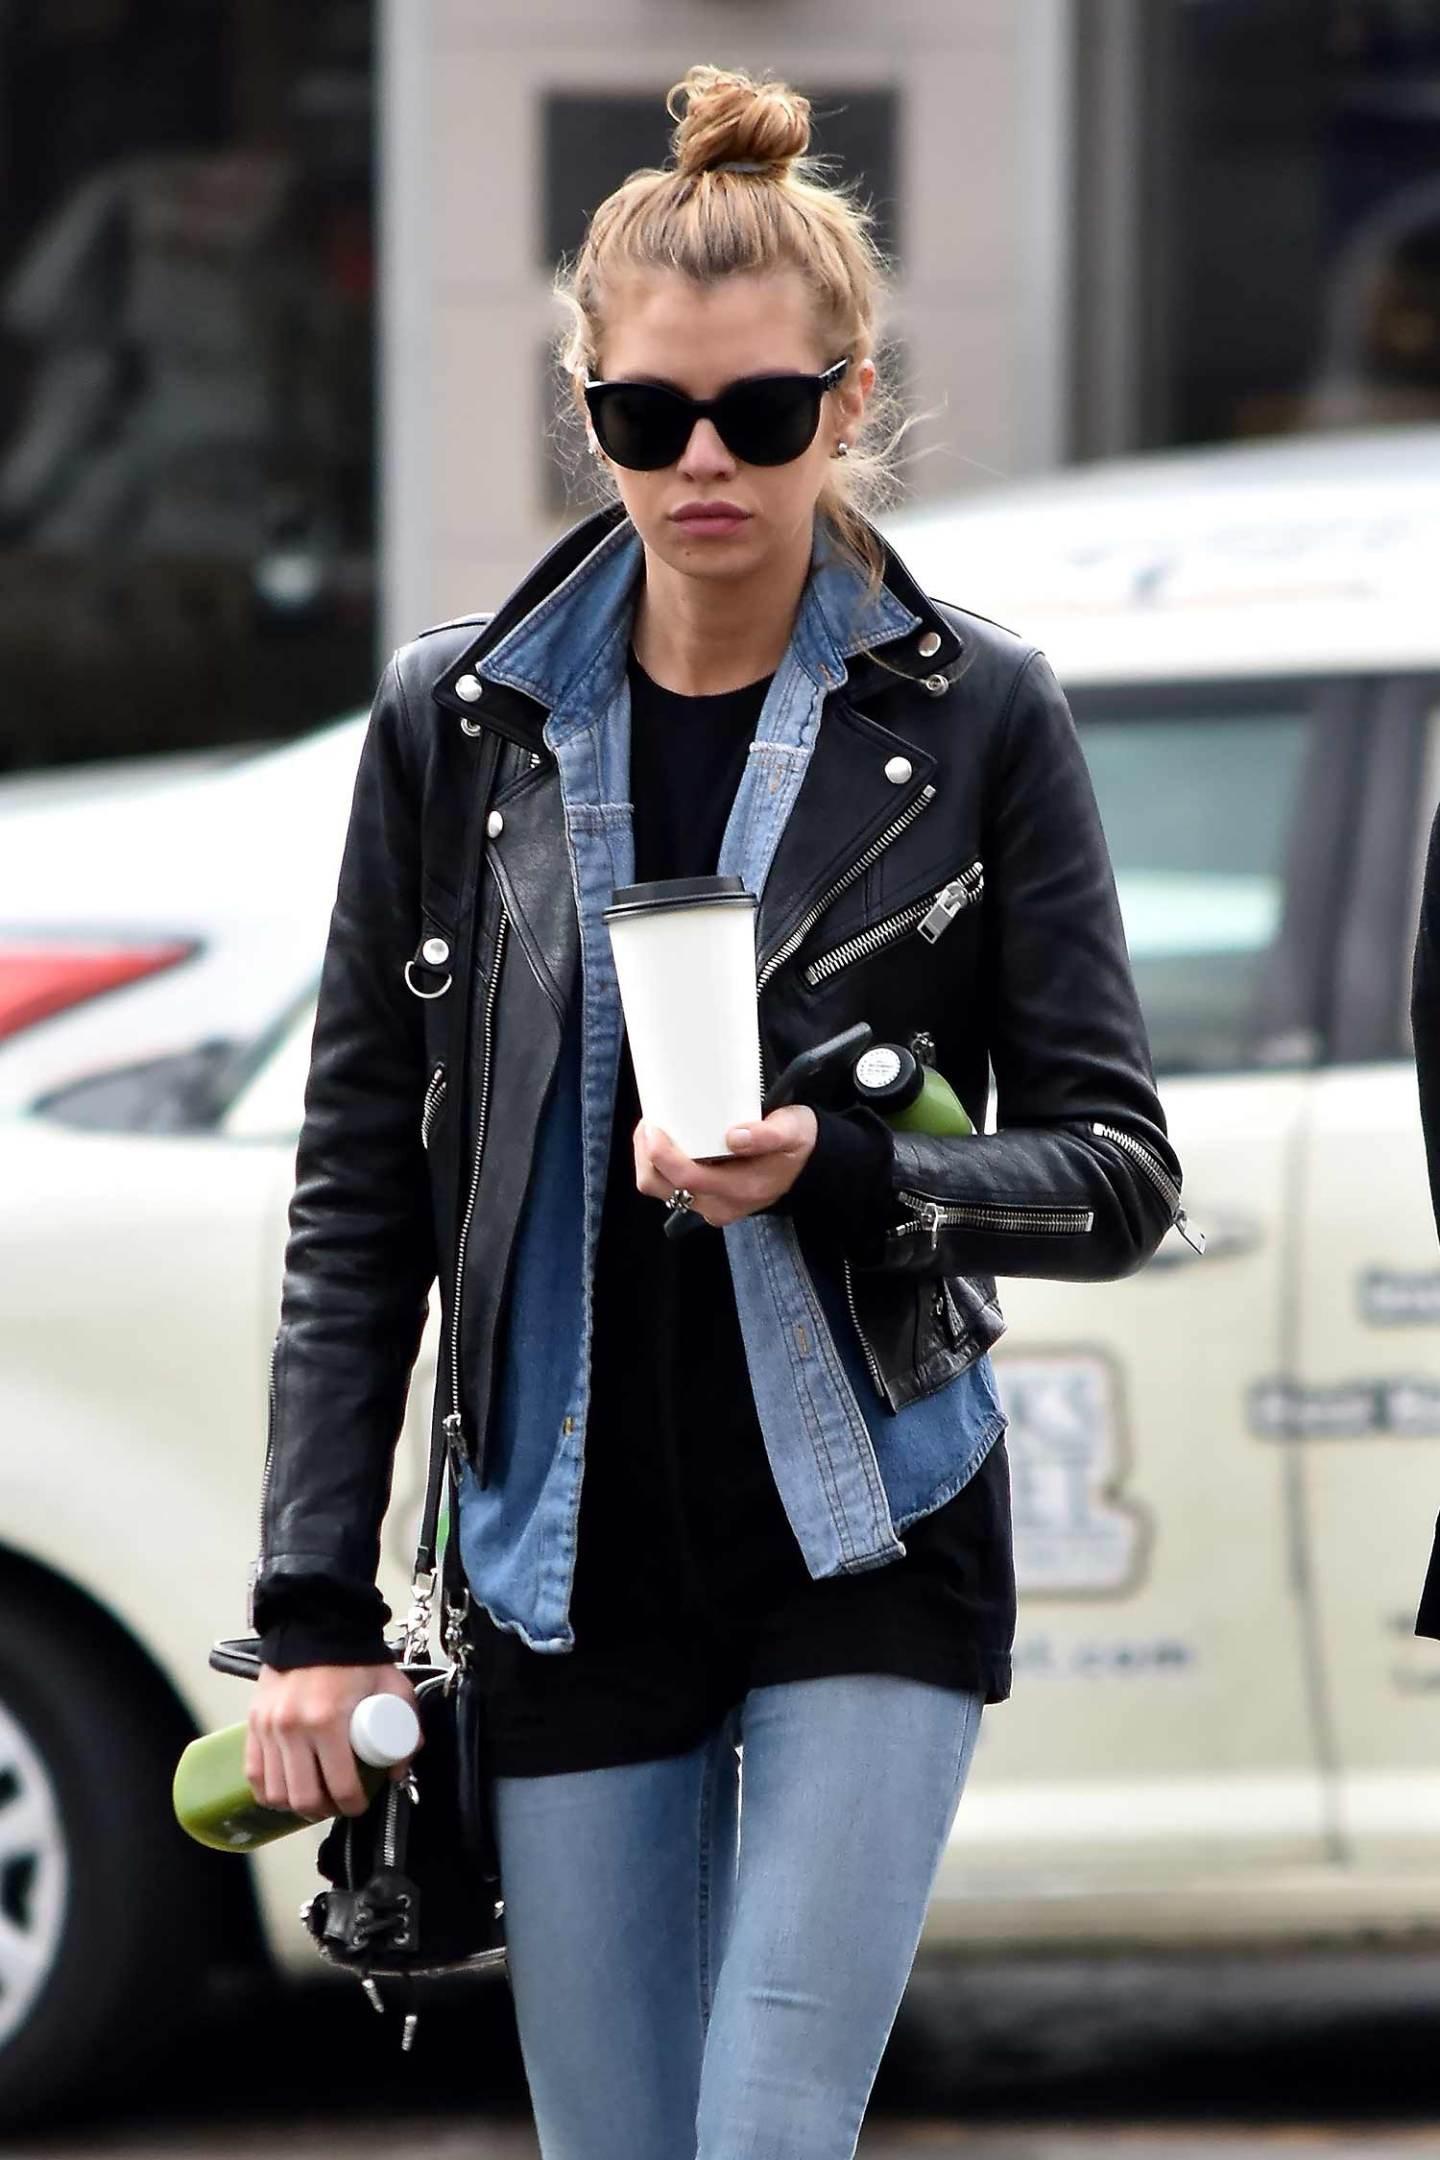 stella-maxwell-double-denim-leather-jacket